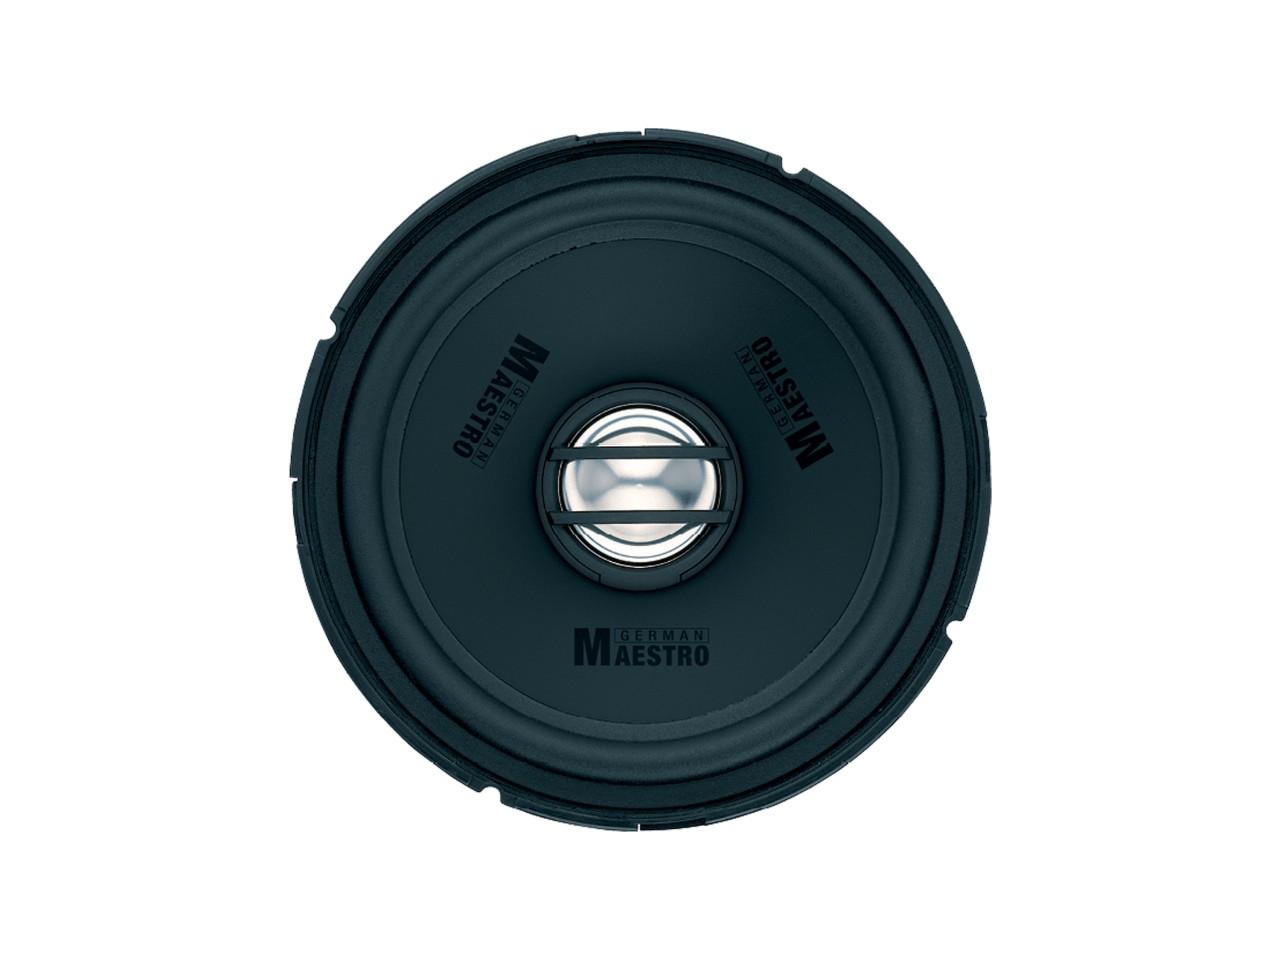 CONCEPT CC5008 | 2-Wege Coaxila-Sepaker 130mm | German Maestro